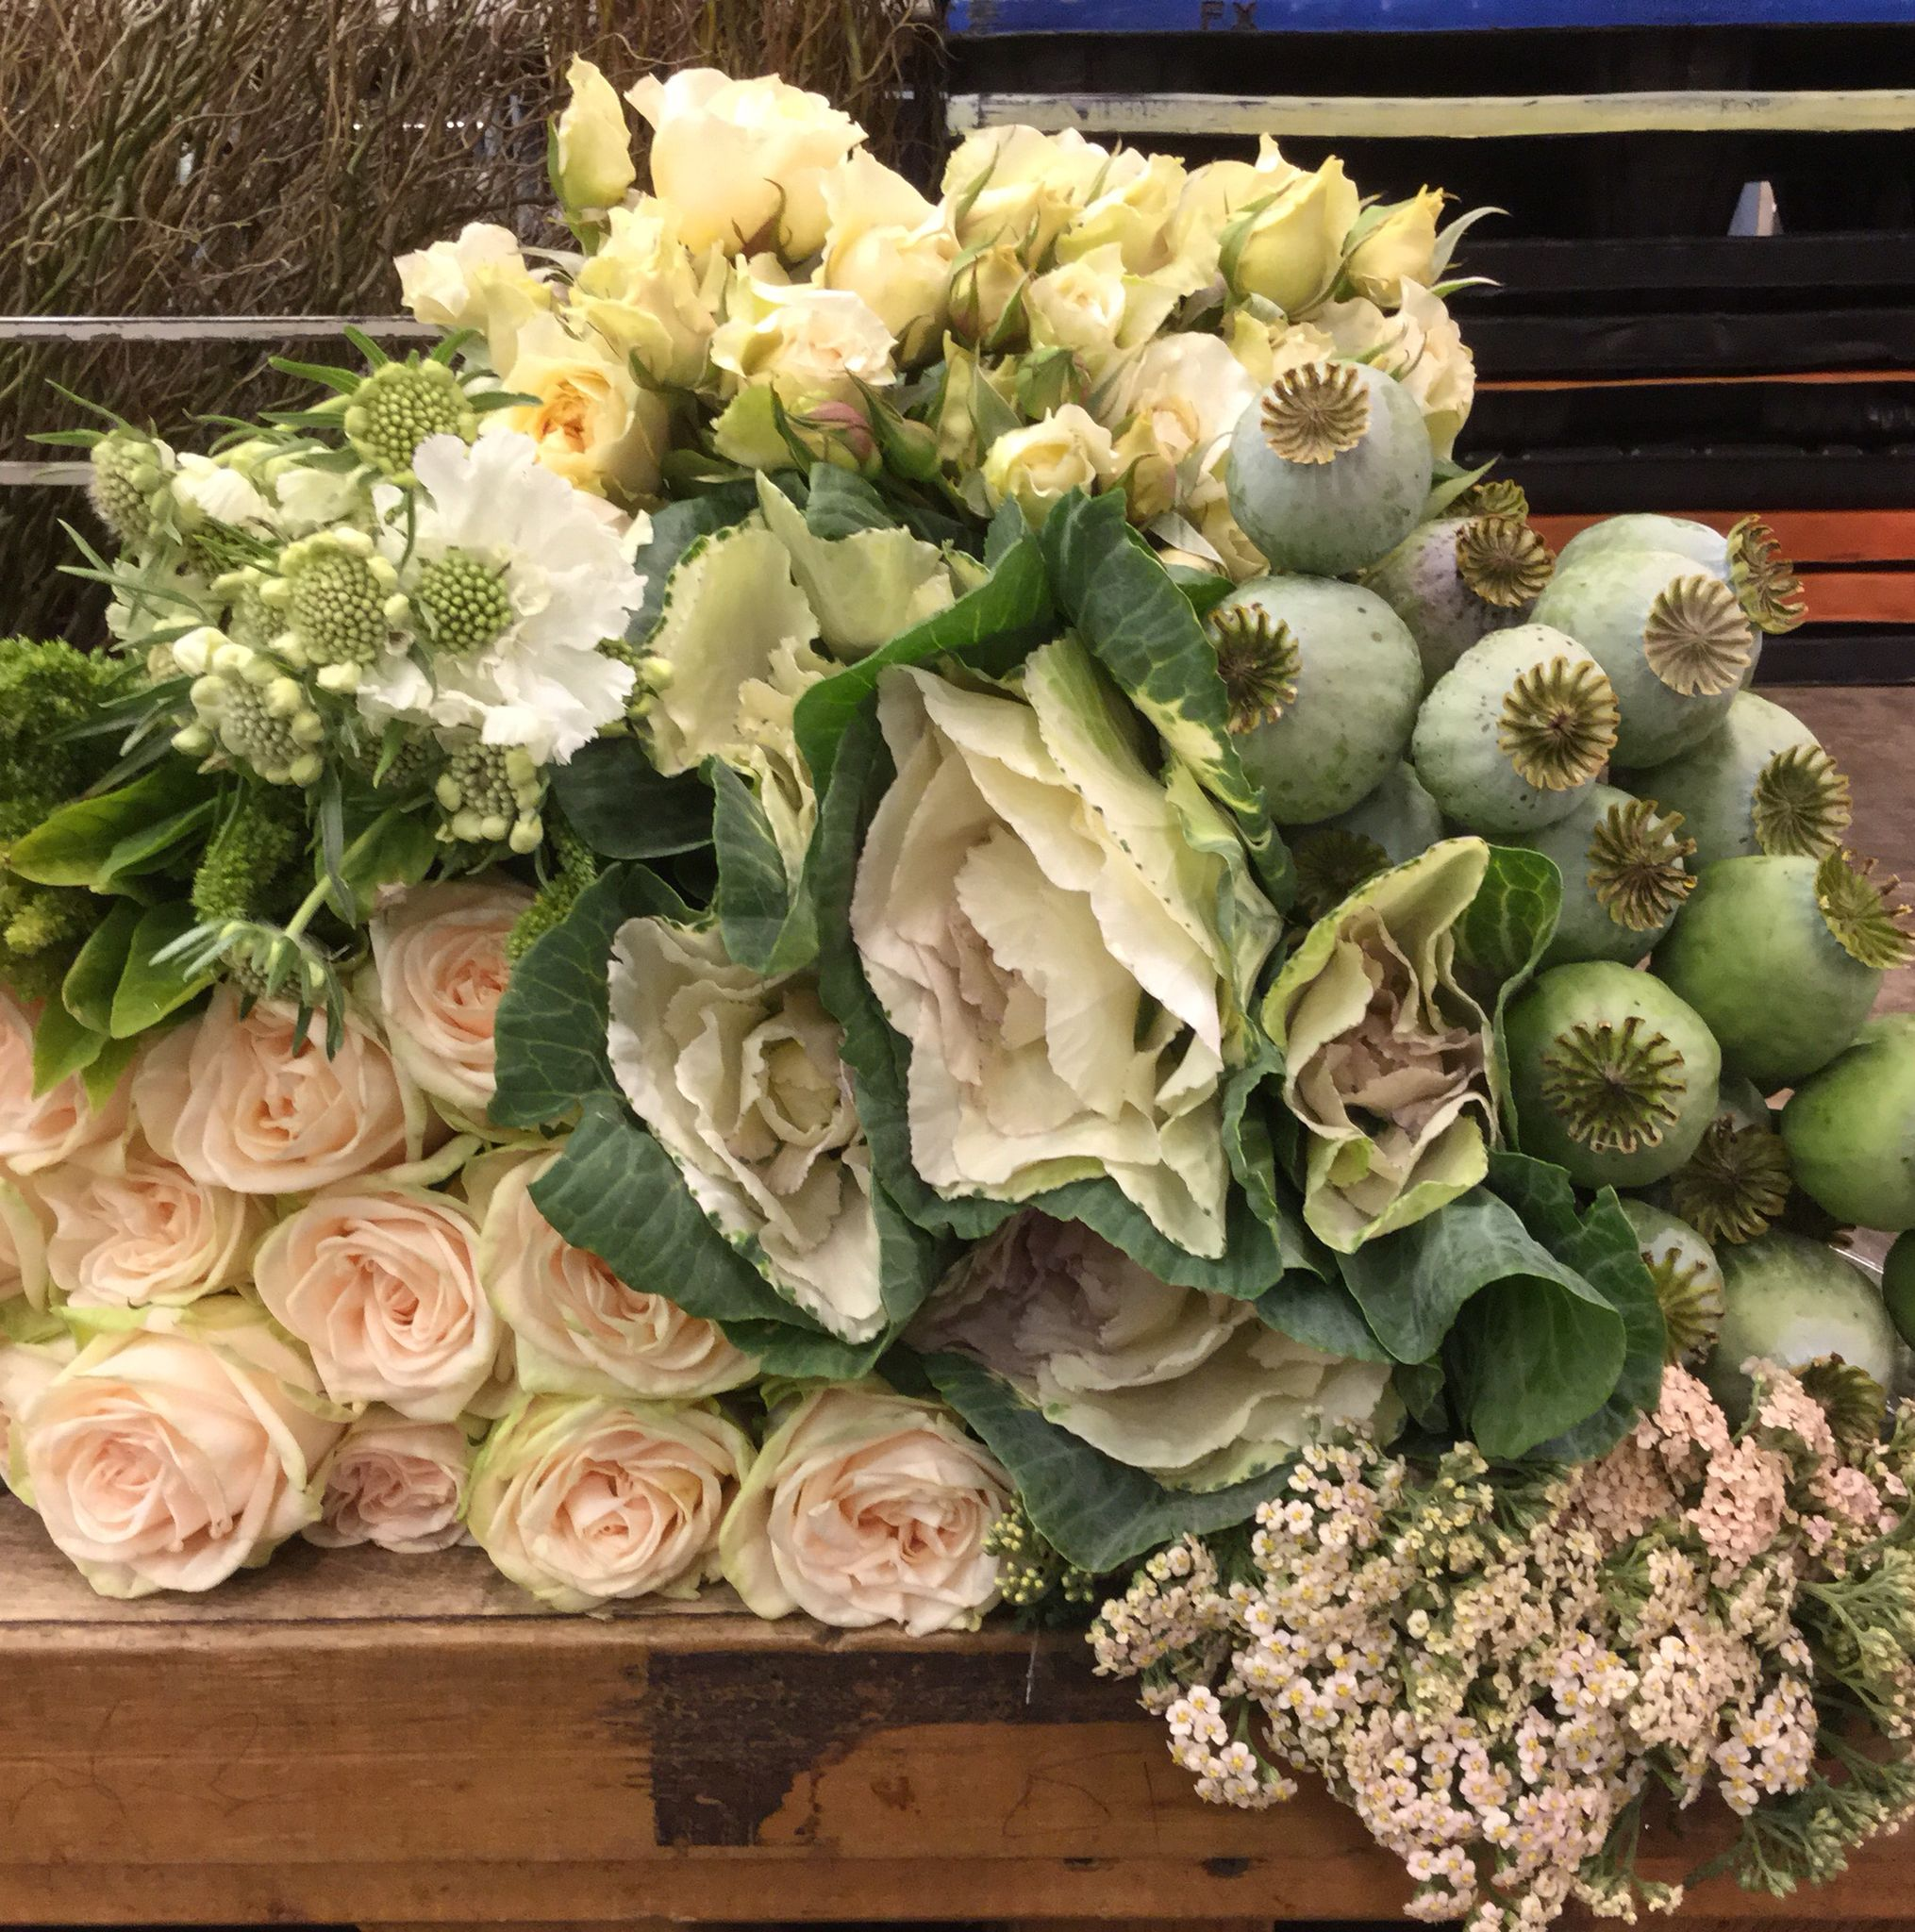 Gwendolyn Garden Roses Upright Green Amaranthus White Scabiosa